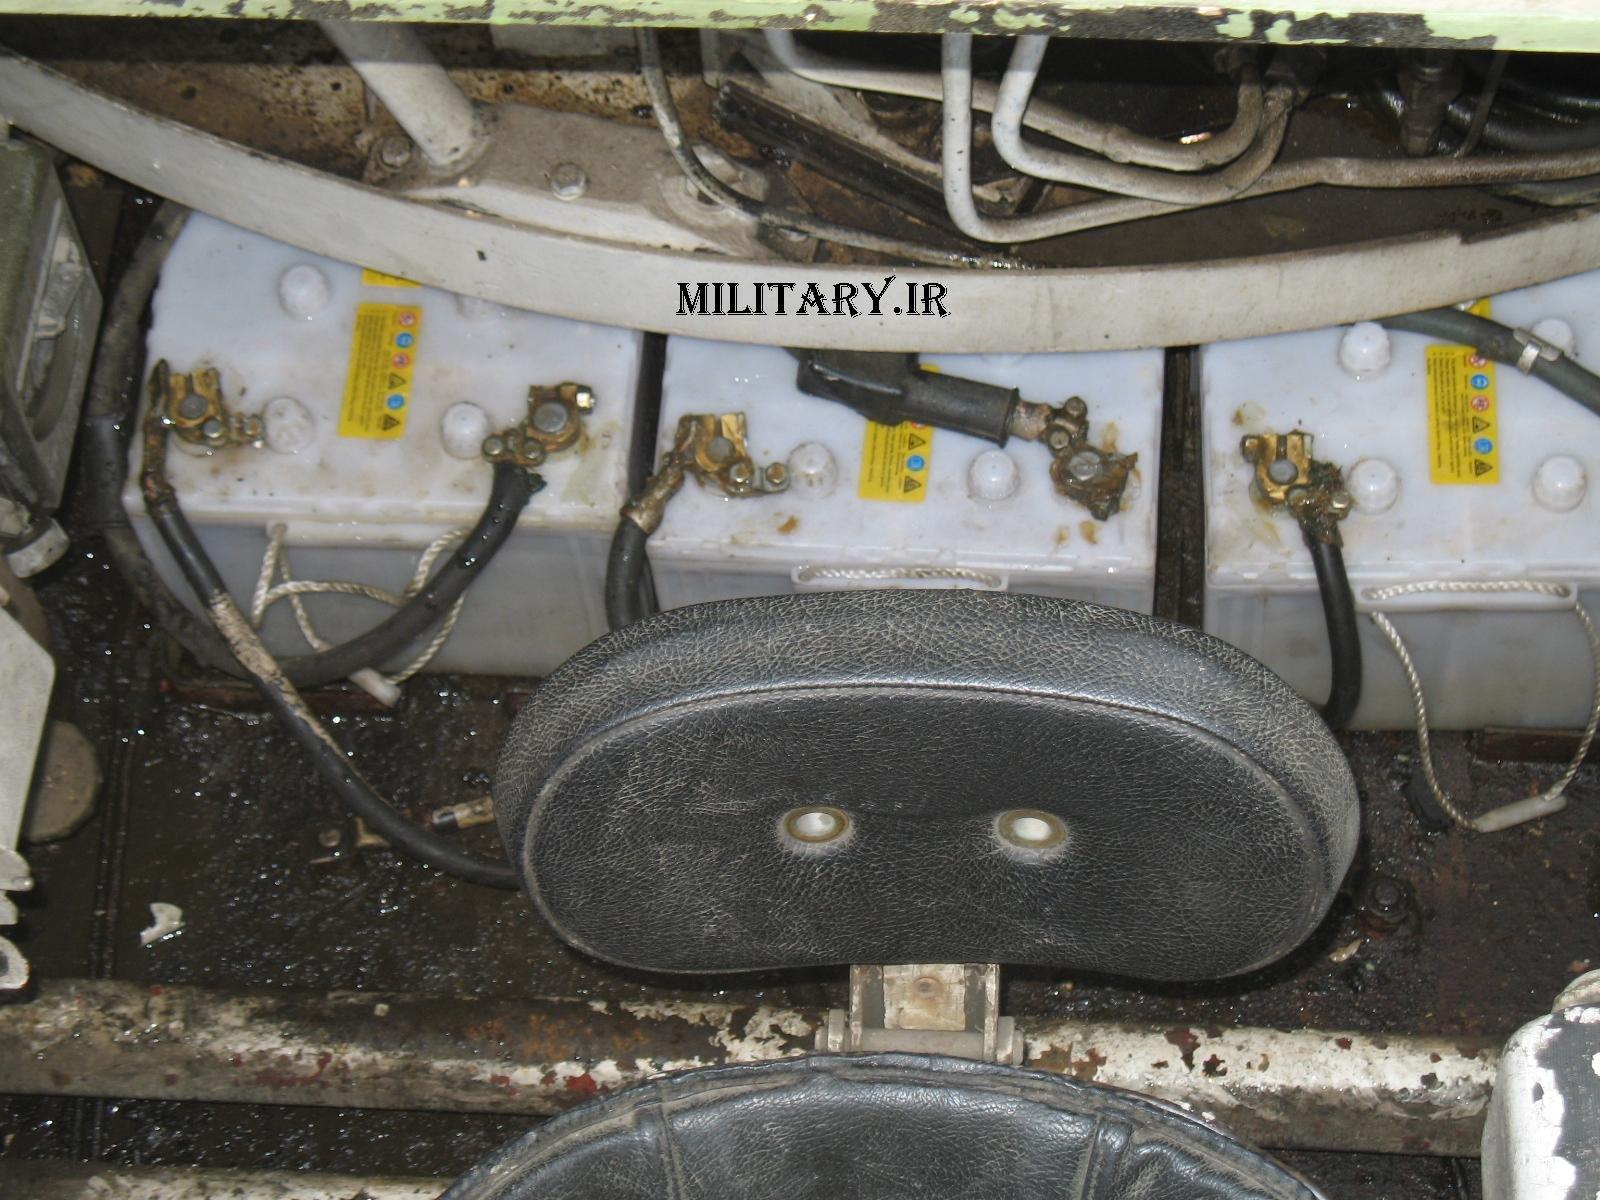 http://gallery.military.ir/albums/userpics/Zulfiqar1_%286%29.JPG